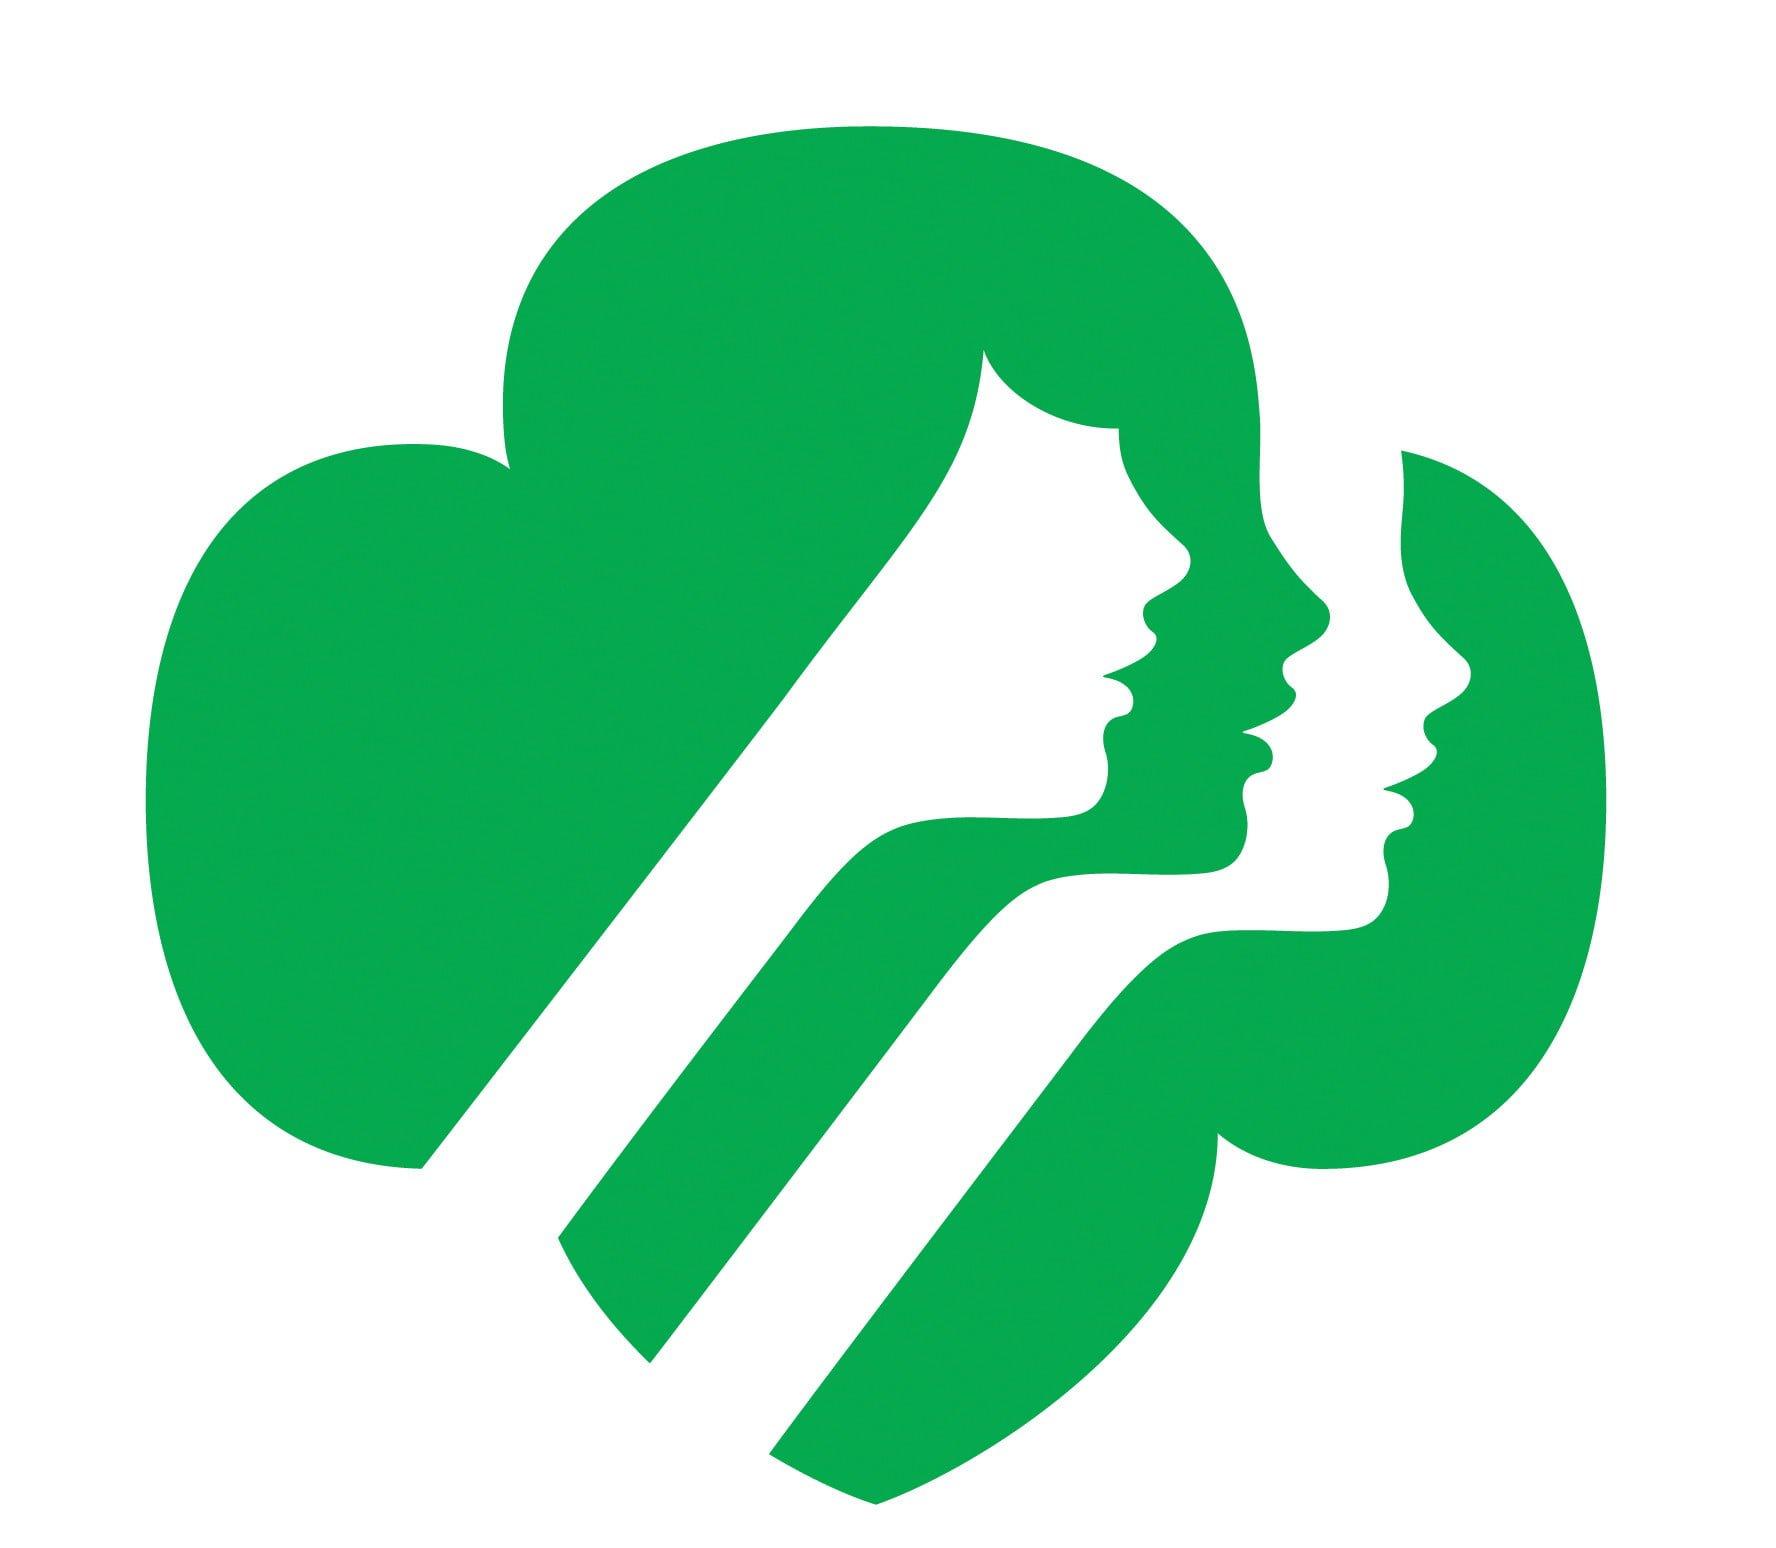 New Girlscout logo - 2018 - Catawba Science Center ...